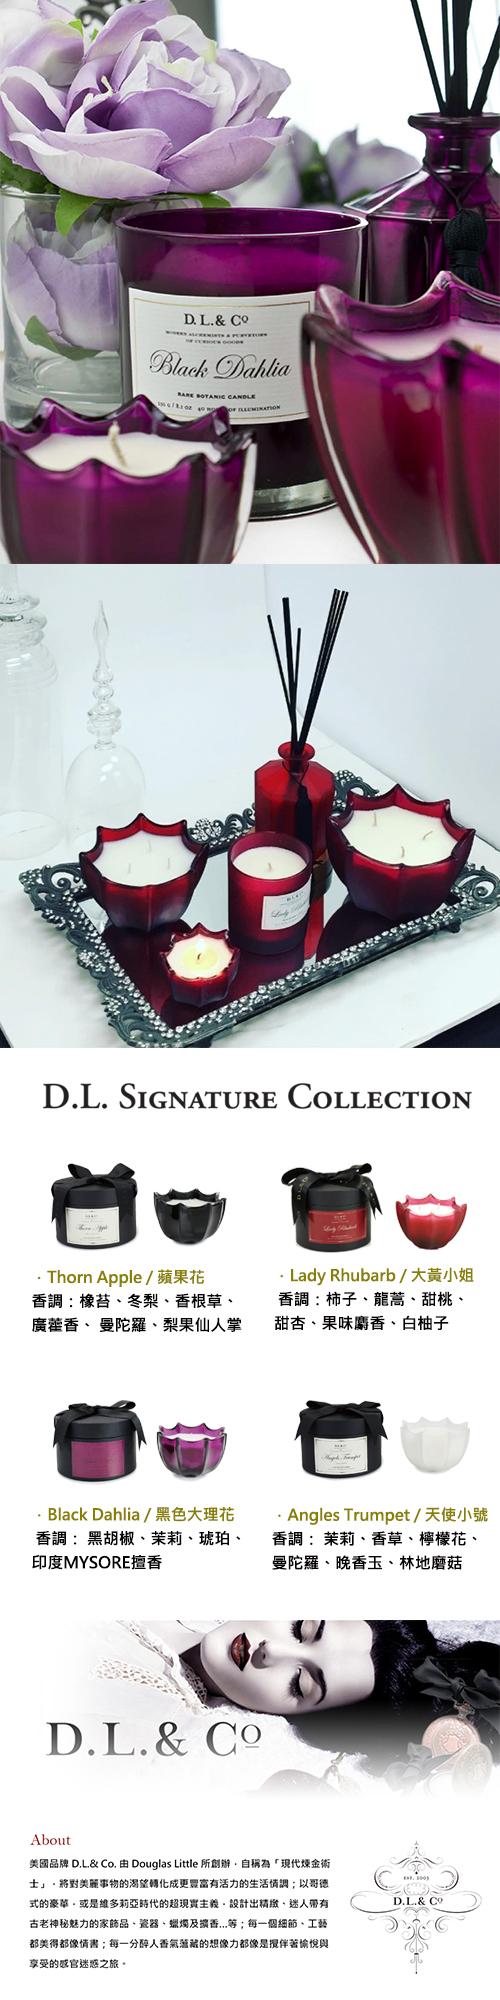 D.L.&Co 經典系列貝殼杯蠟 大黃小姐